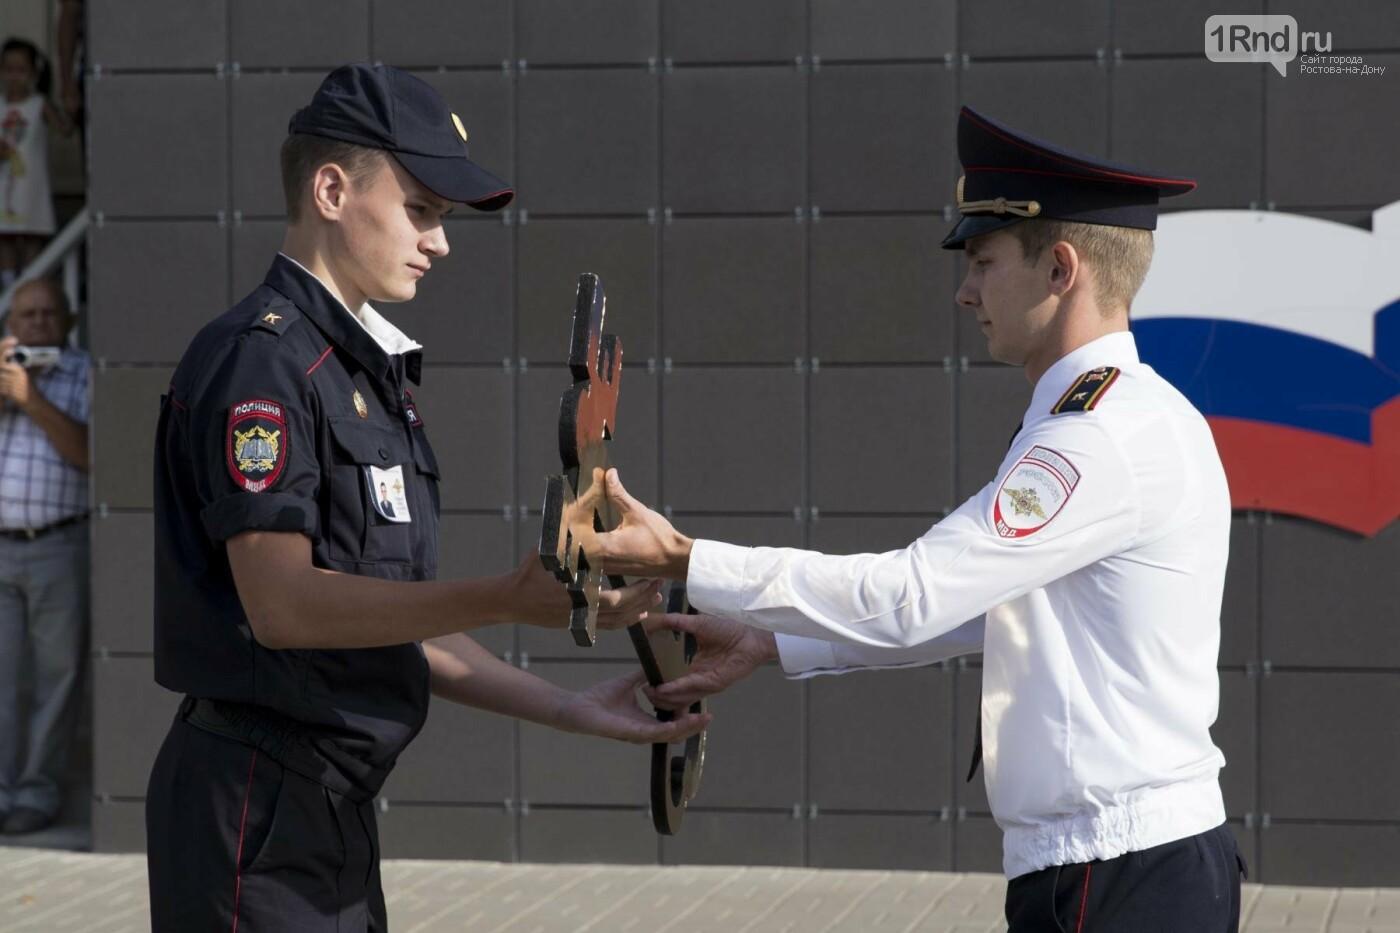 Первокурсники РЮИ МВД России получили ключ знаний, фото-2